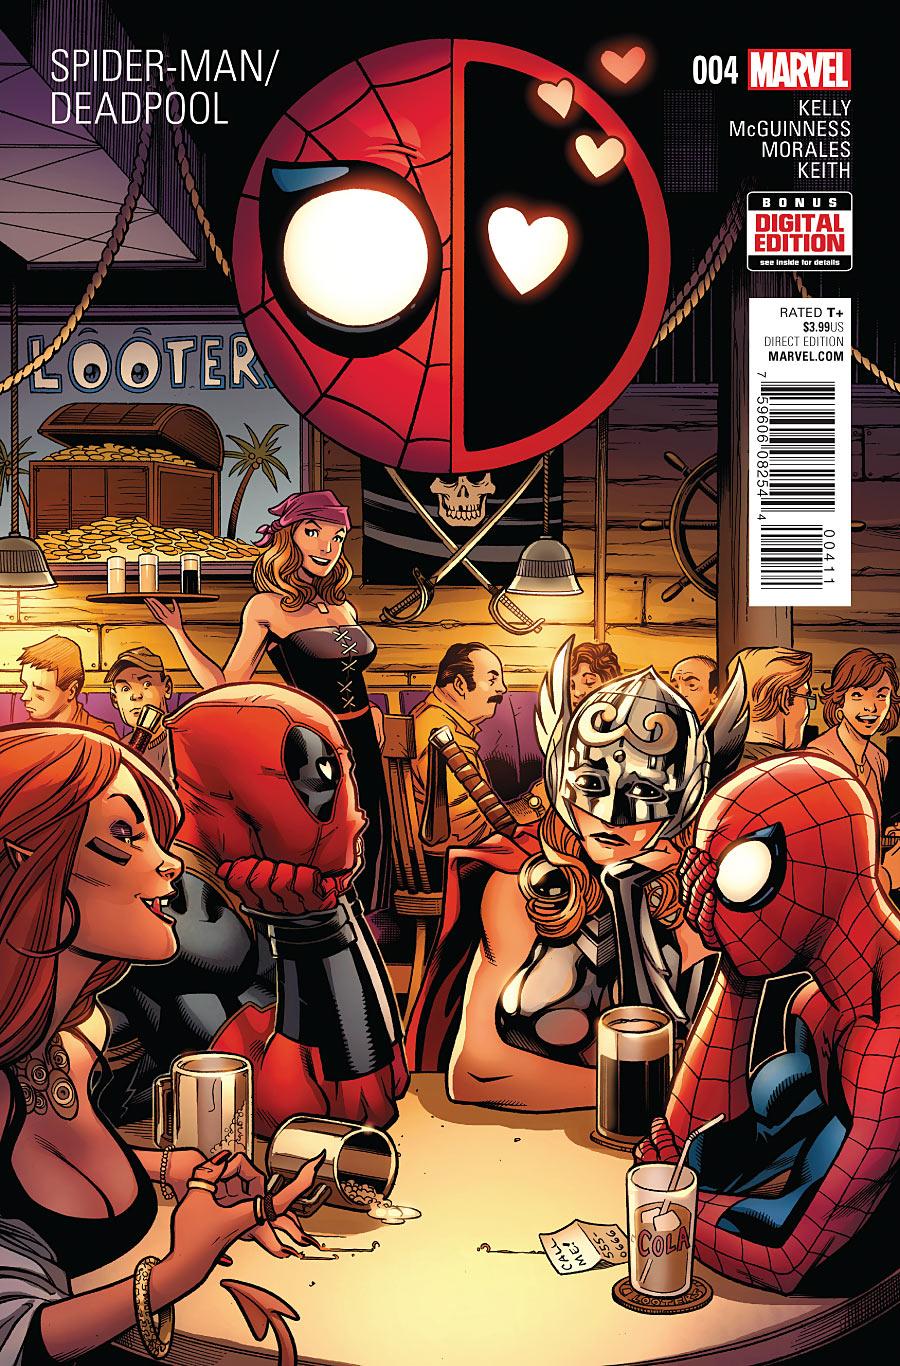 Spider-Man / Deadpool #4